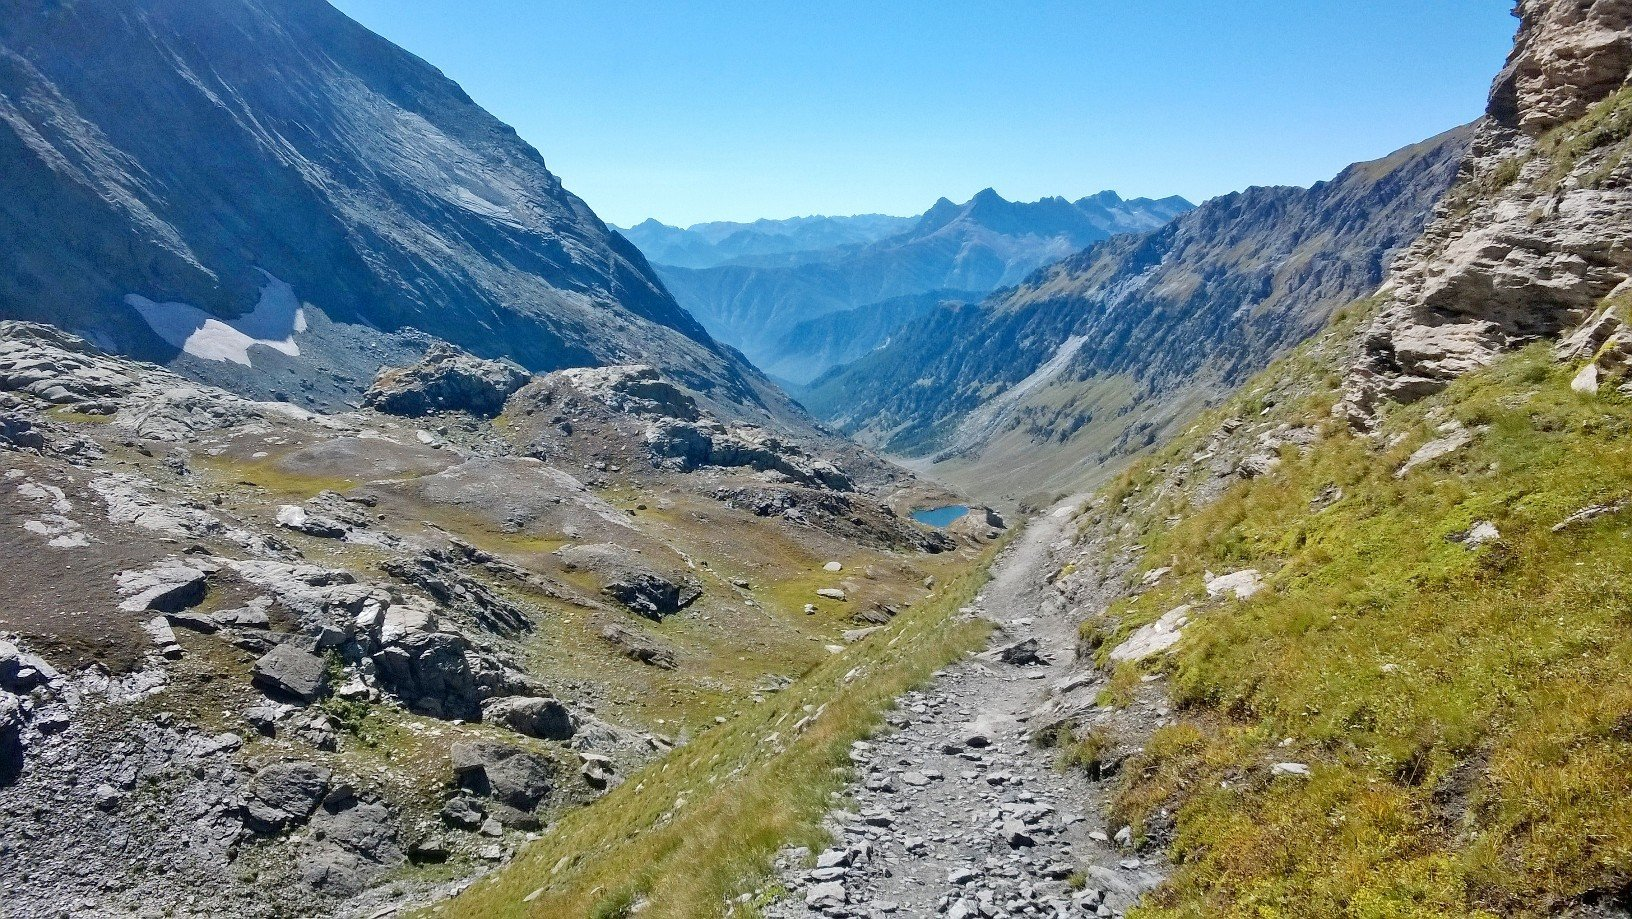 Salendo al Passo Vallanta